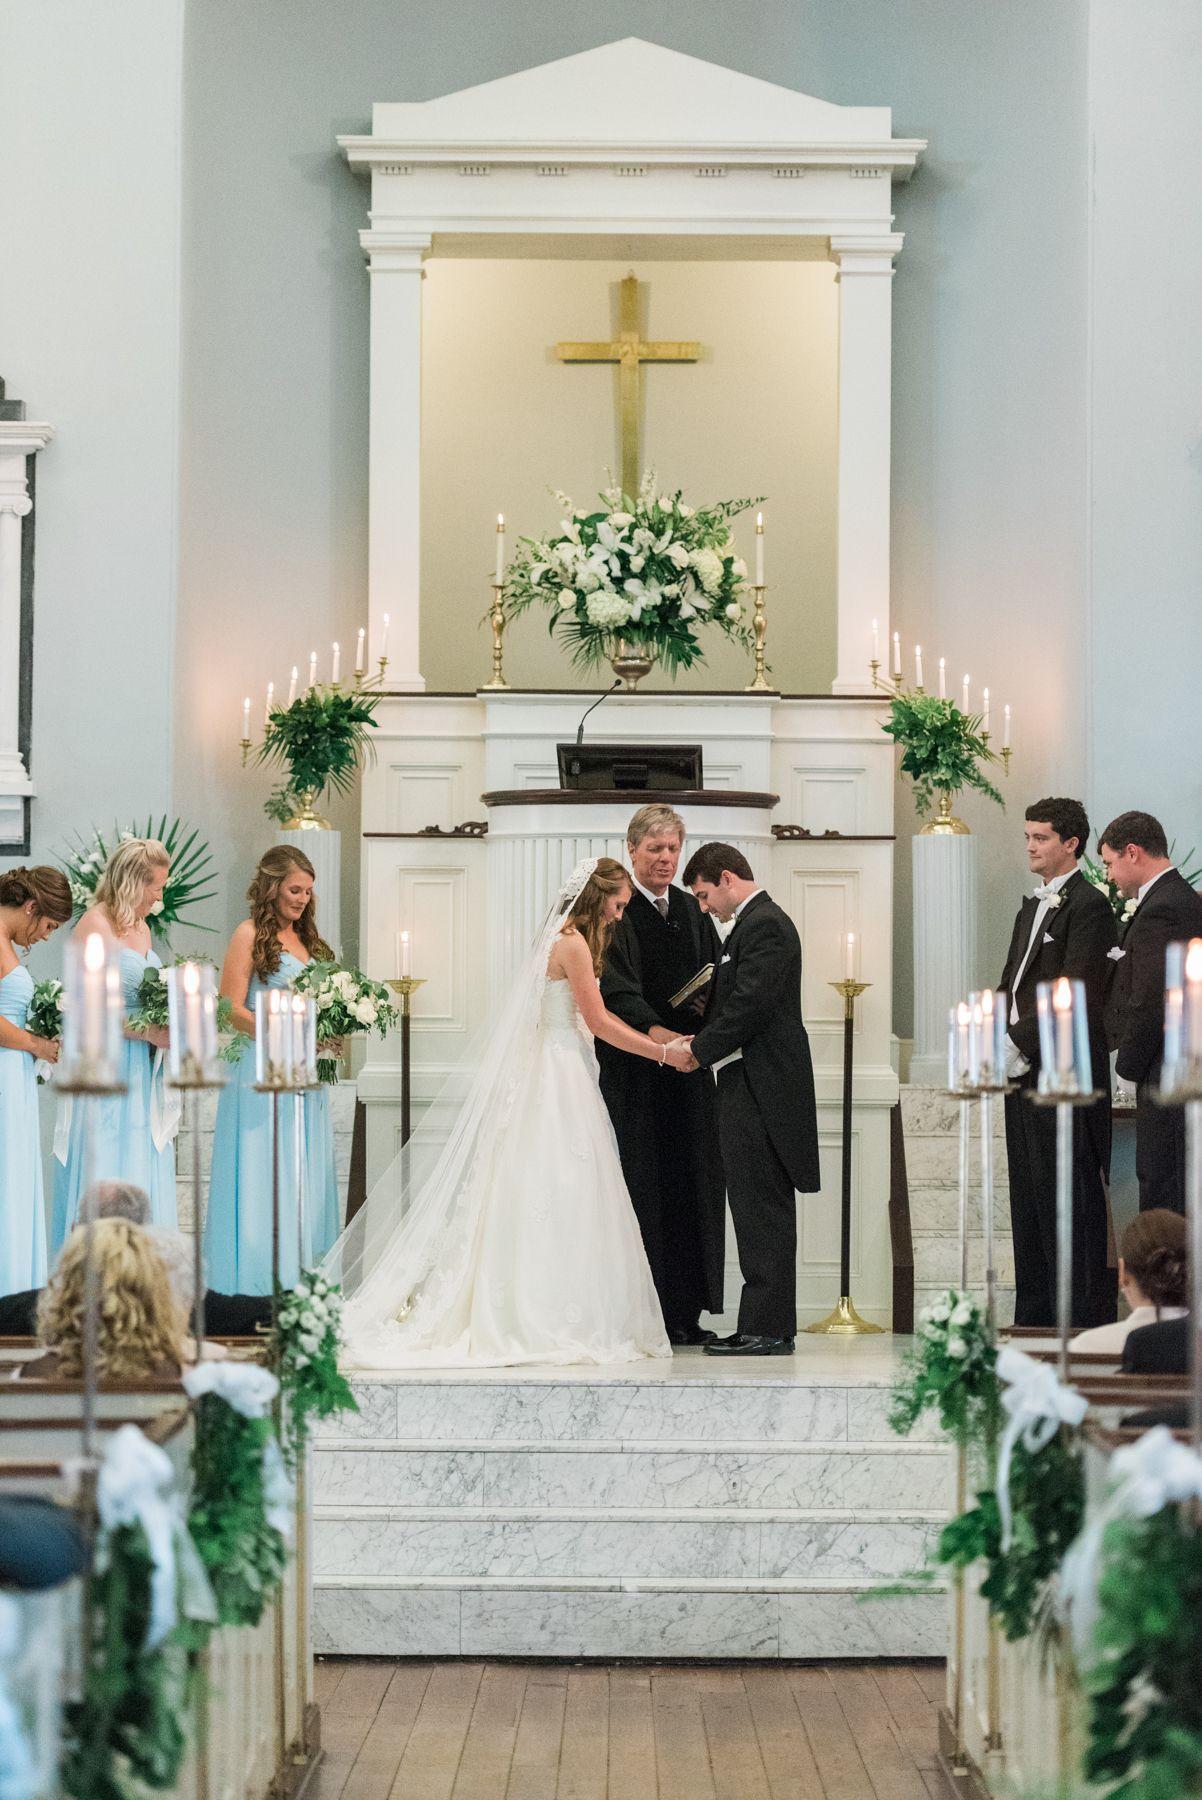 Southern Wedding Ceremony First Baptist Church Charleston Sc Wedding Church Decor Wedding Church Aisle Church Wedding Decorations